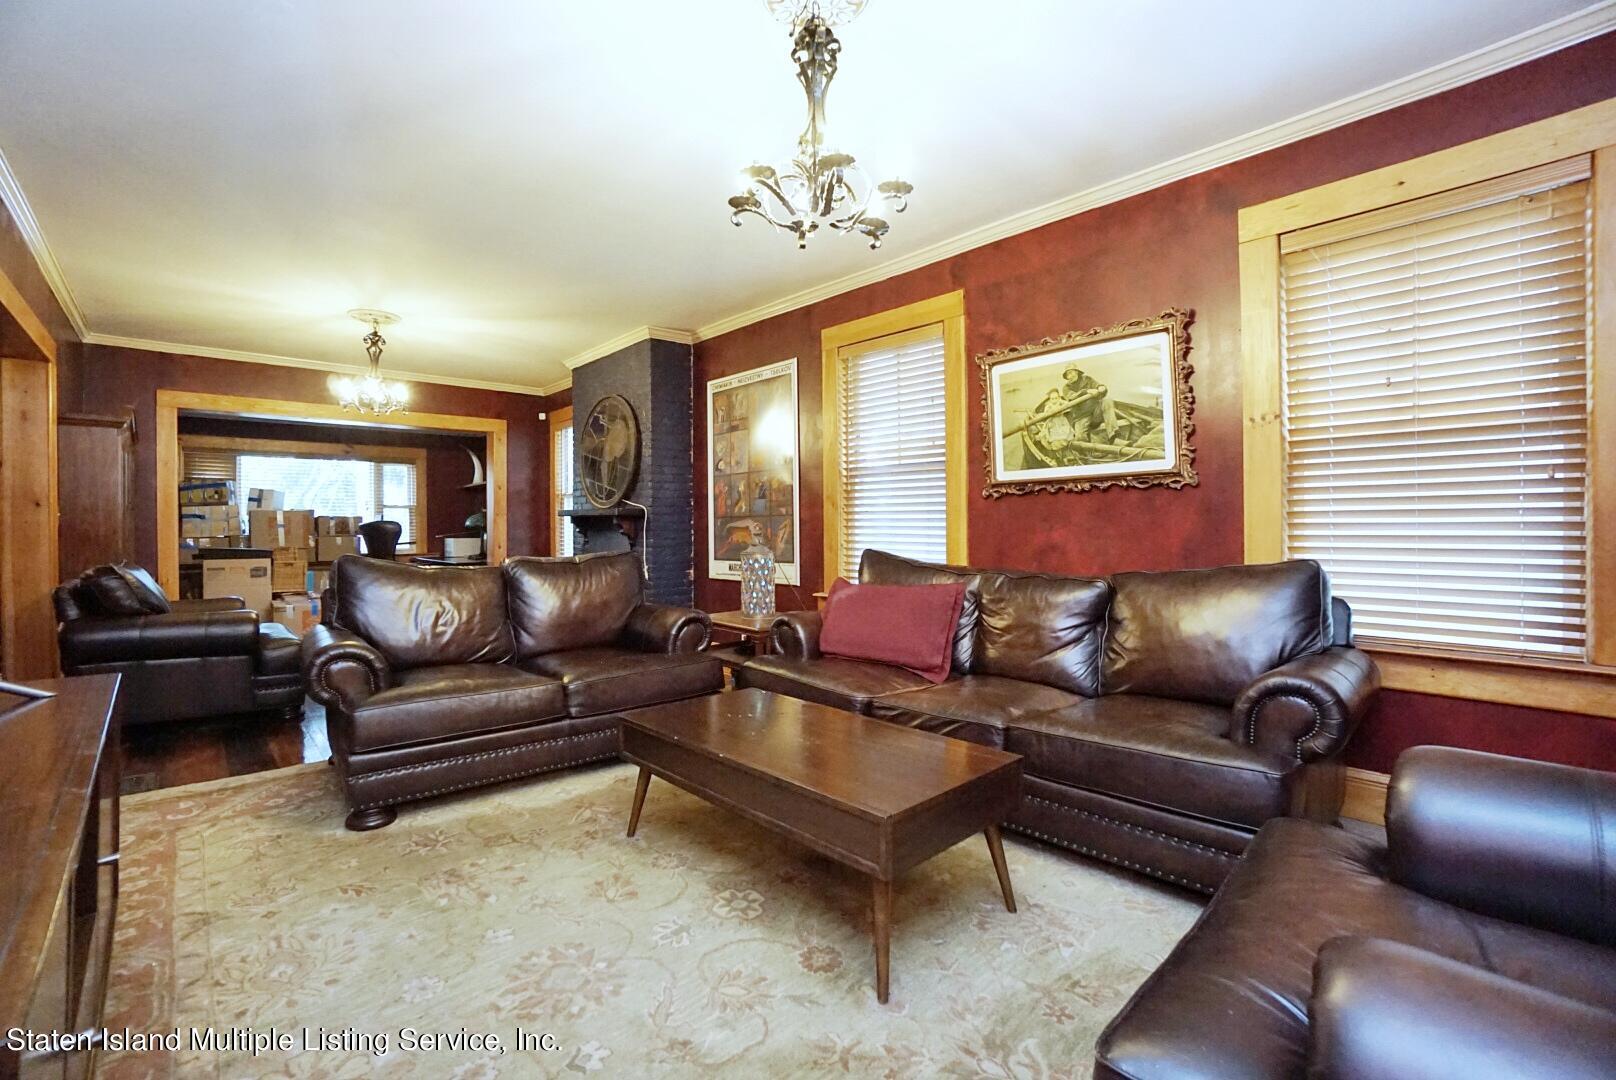 Single Family - Detached 136 York Avenue  Staten Island, NY 10301, MLS-1147575-12